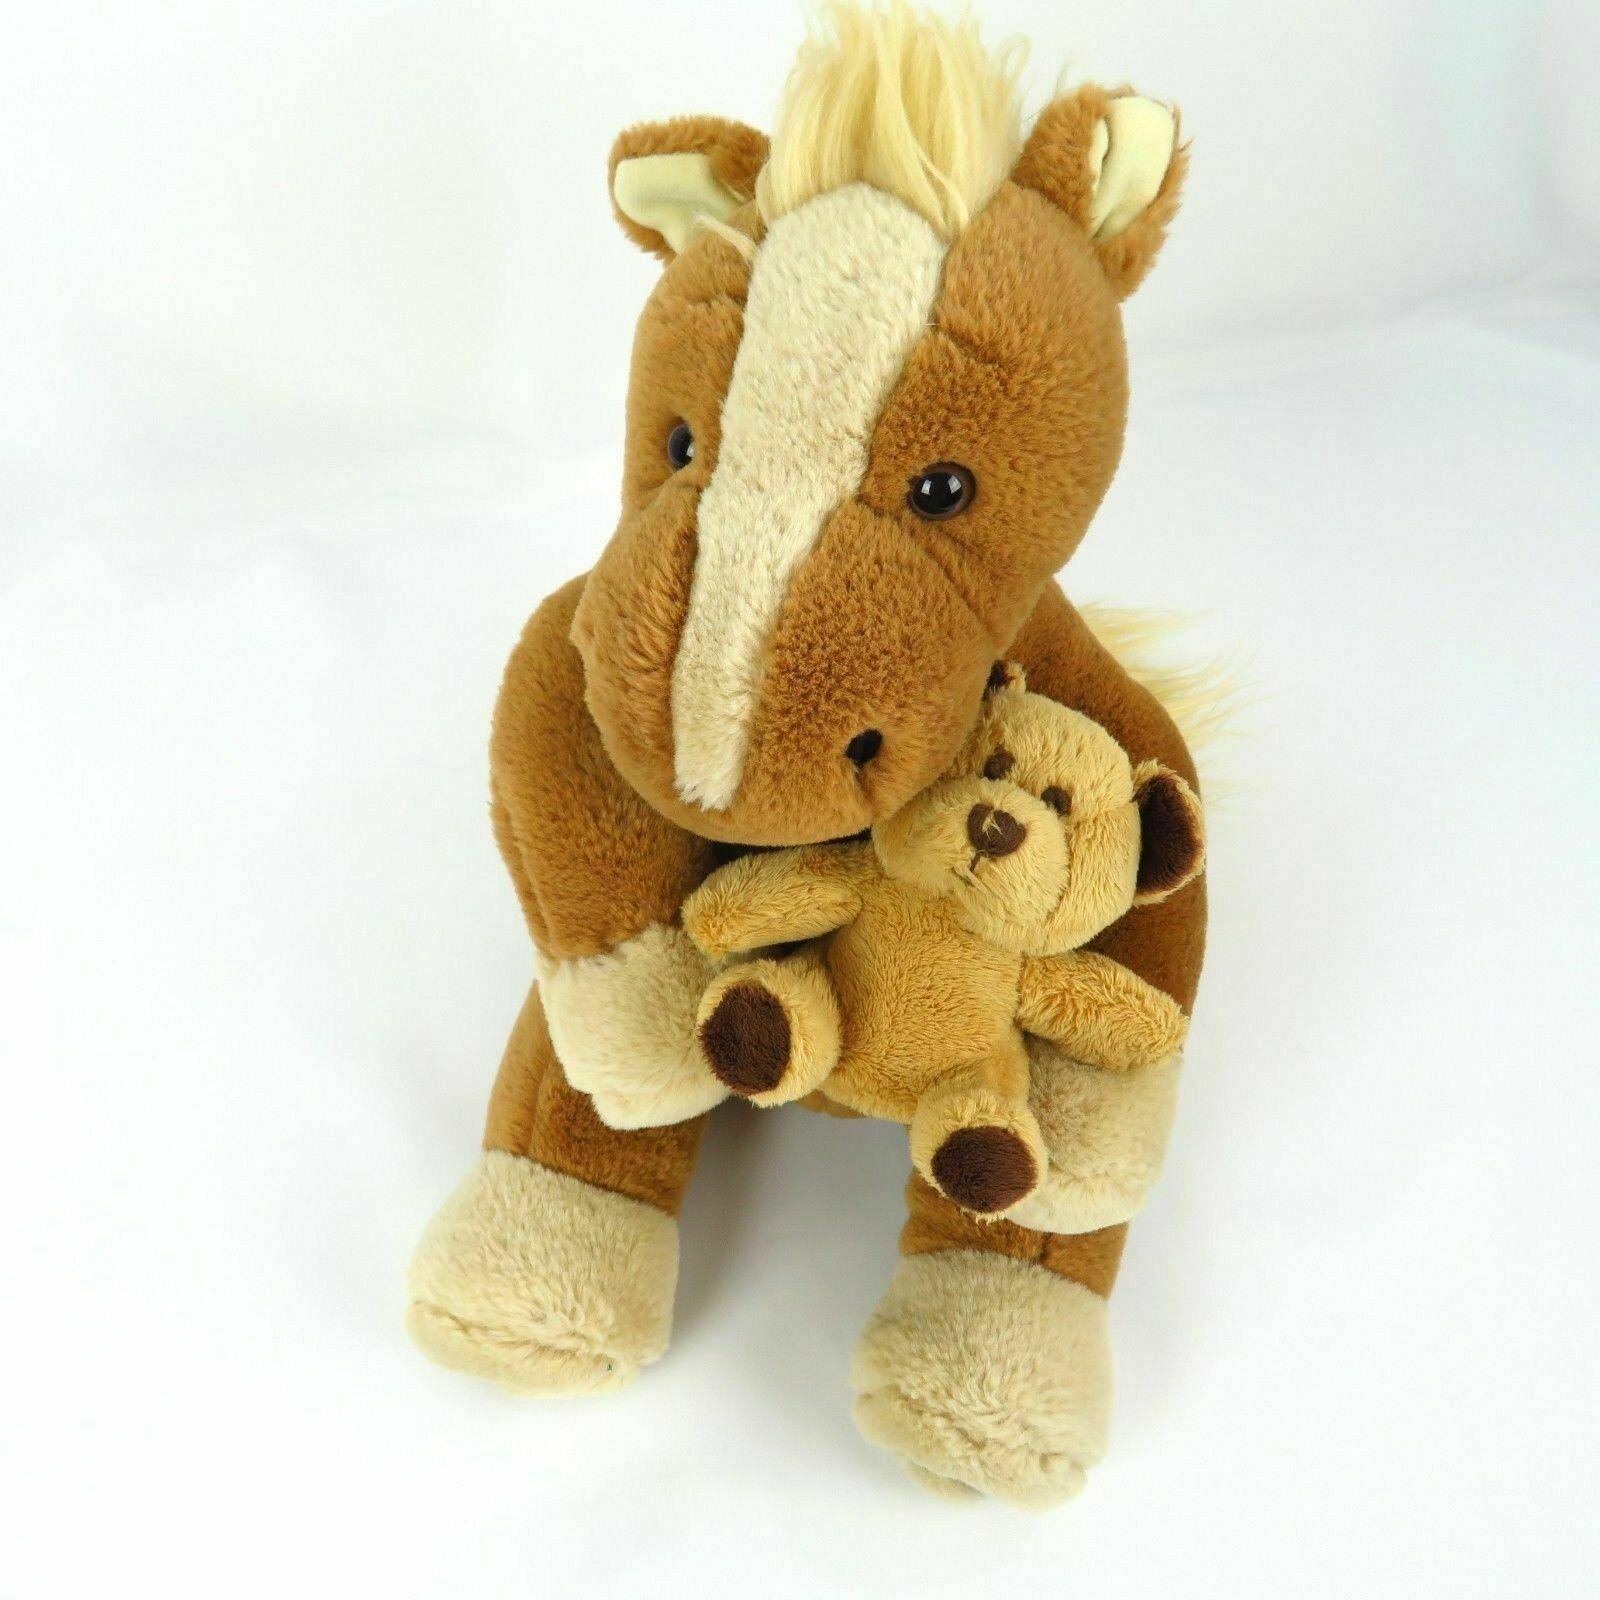 Horse Pony Plush Teddy Bear Breyer Animal Creations Stuffed Animal 2007 Toy Doll - $39.59